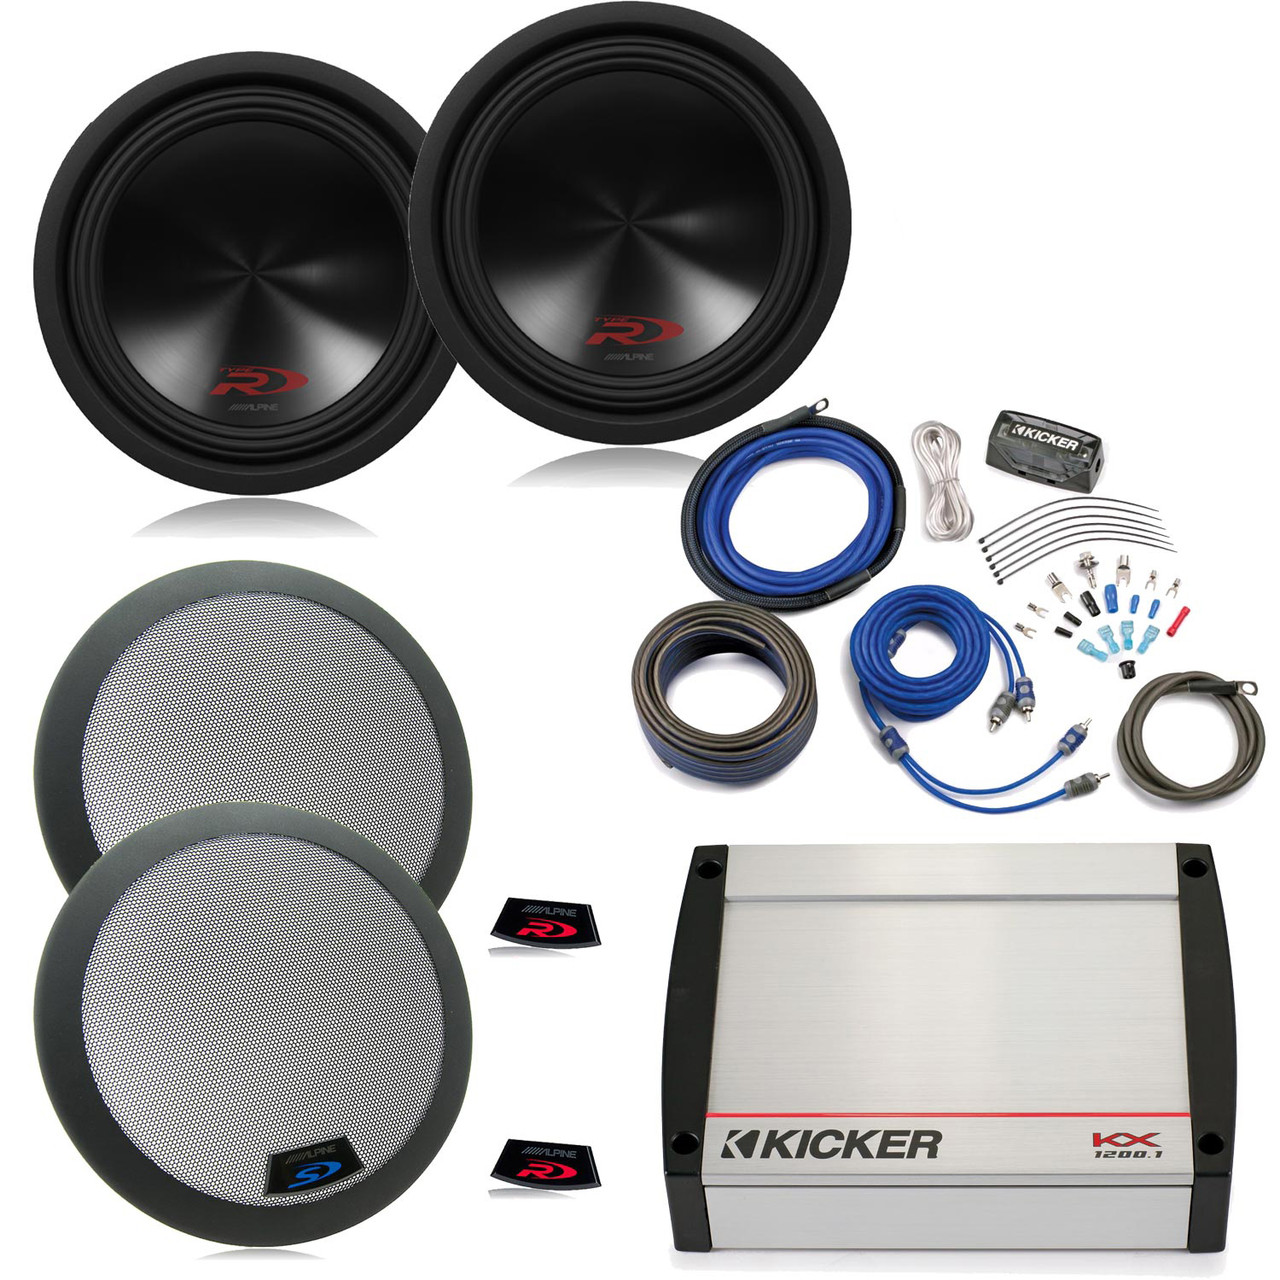 medium resolution of alpine 12 inch type r swr 12d2 subwoofers 2 grills a kicker harley davidson subwoofer speaker audio amplifiers wiring kits audi